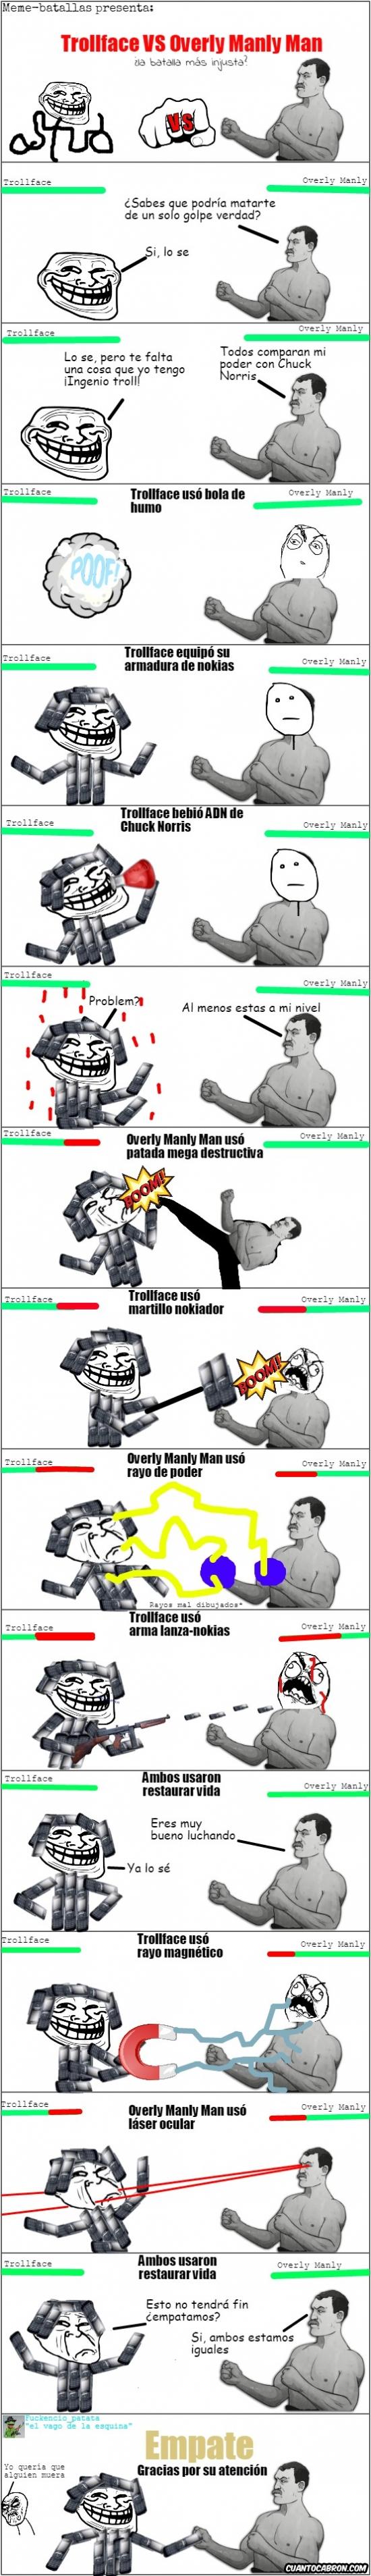 Trollface - Trollface vs... ¿¡Overly Manly Man!? ¿Será una batalla muy injusta?